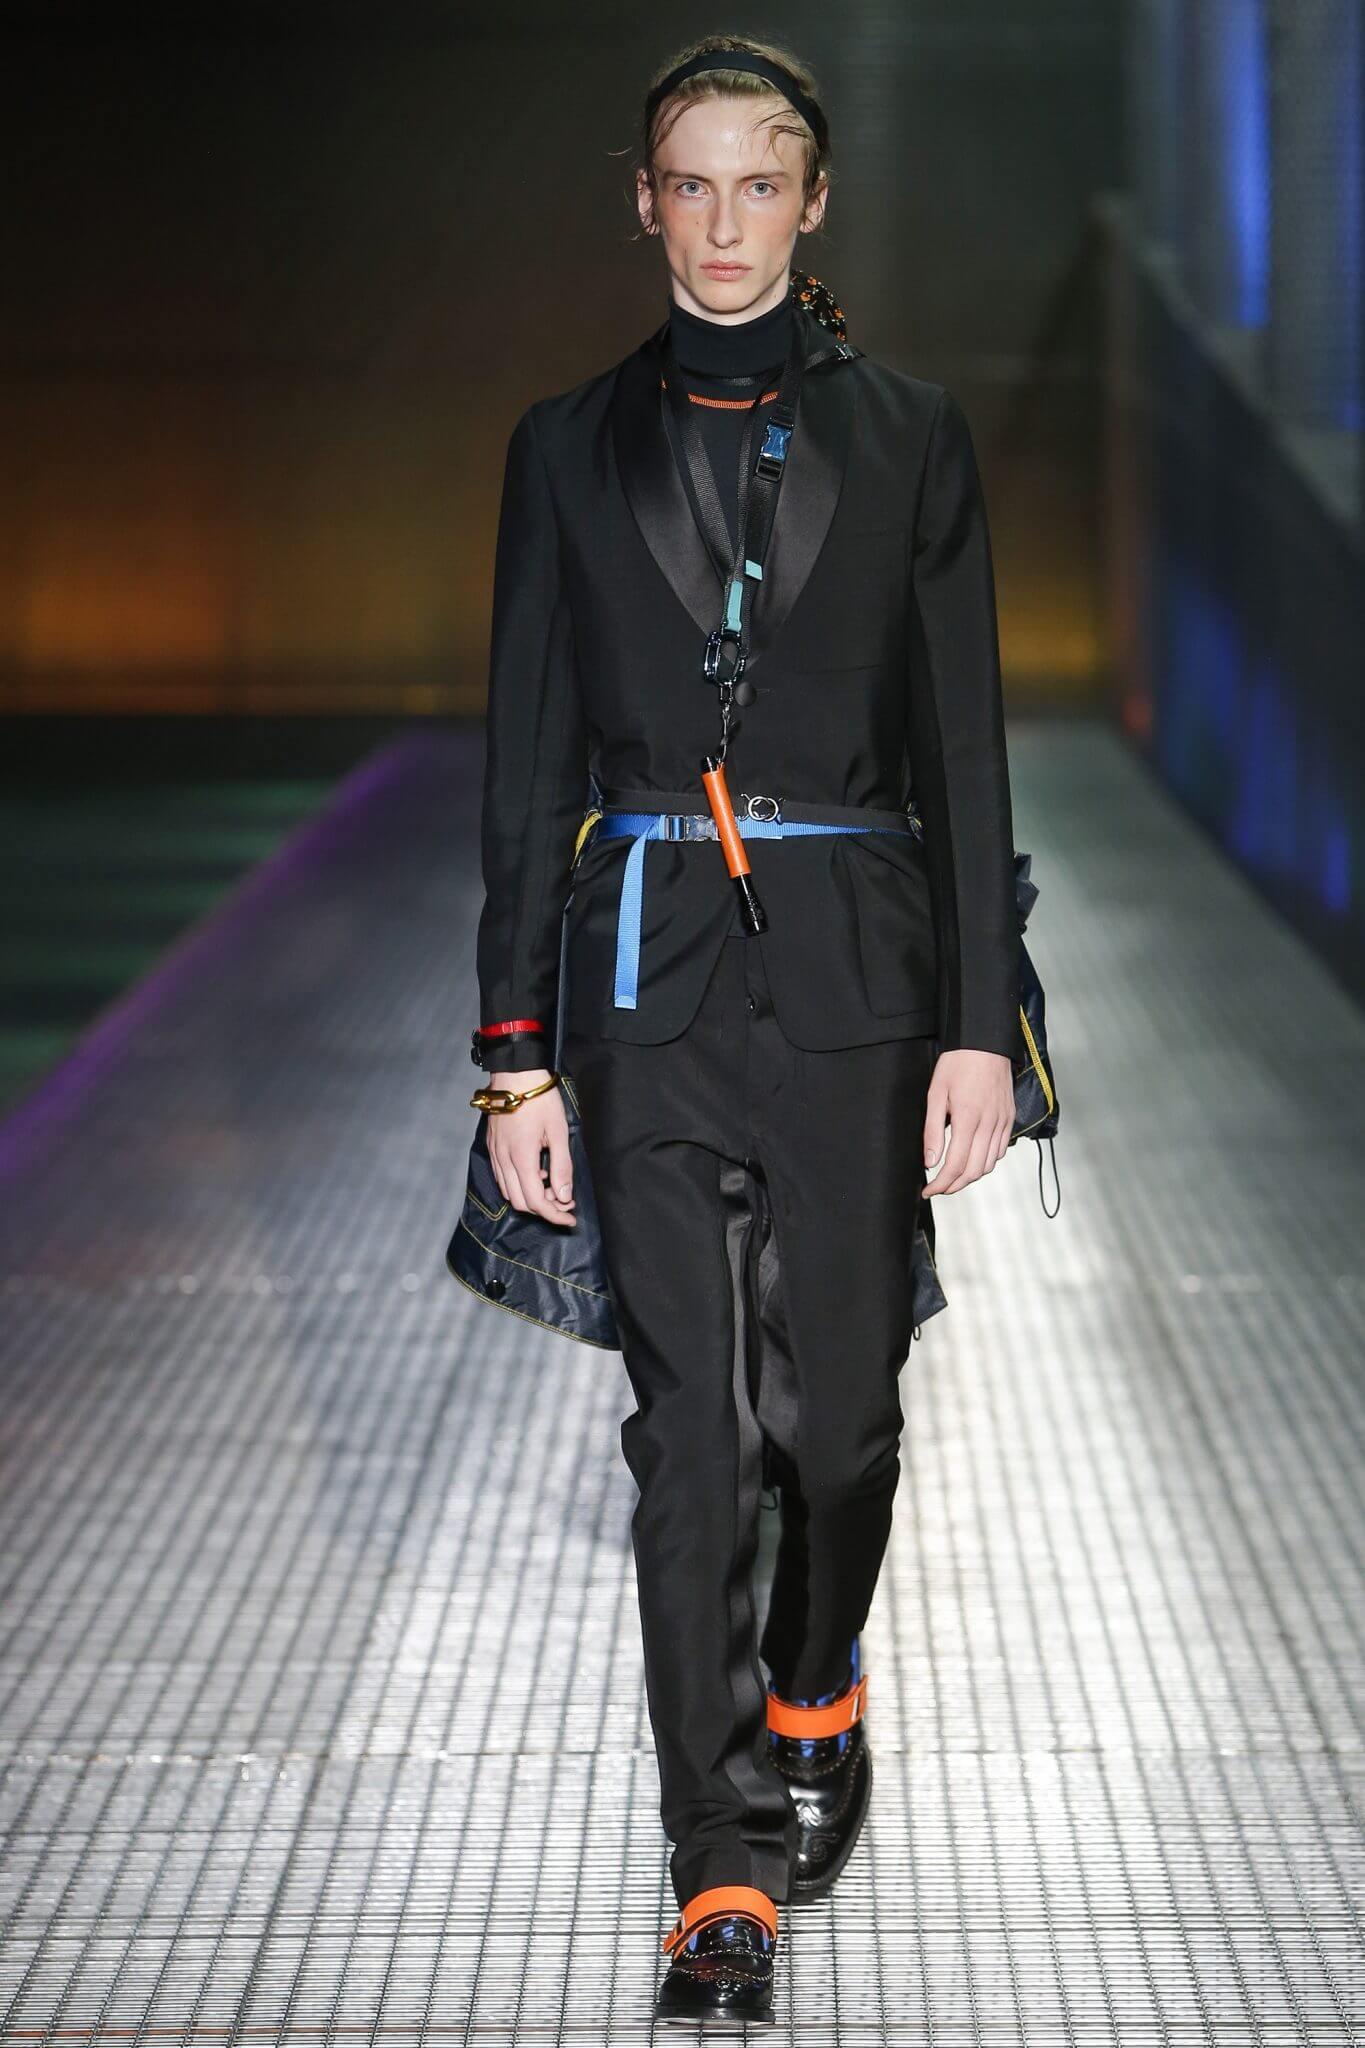 Moda uomo: feticci bondage e fetish